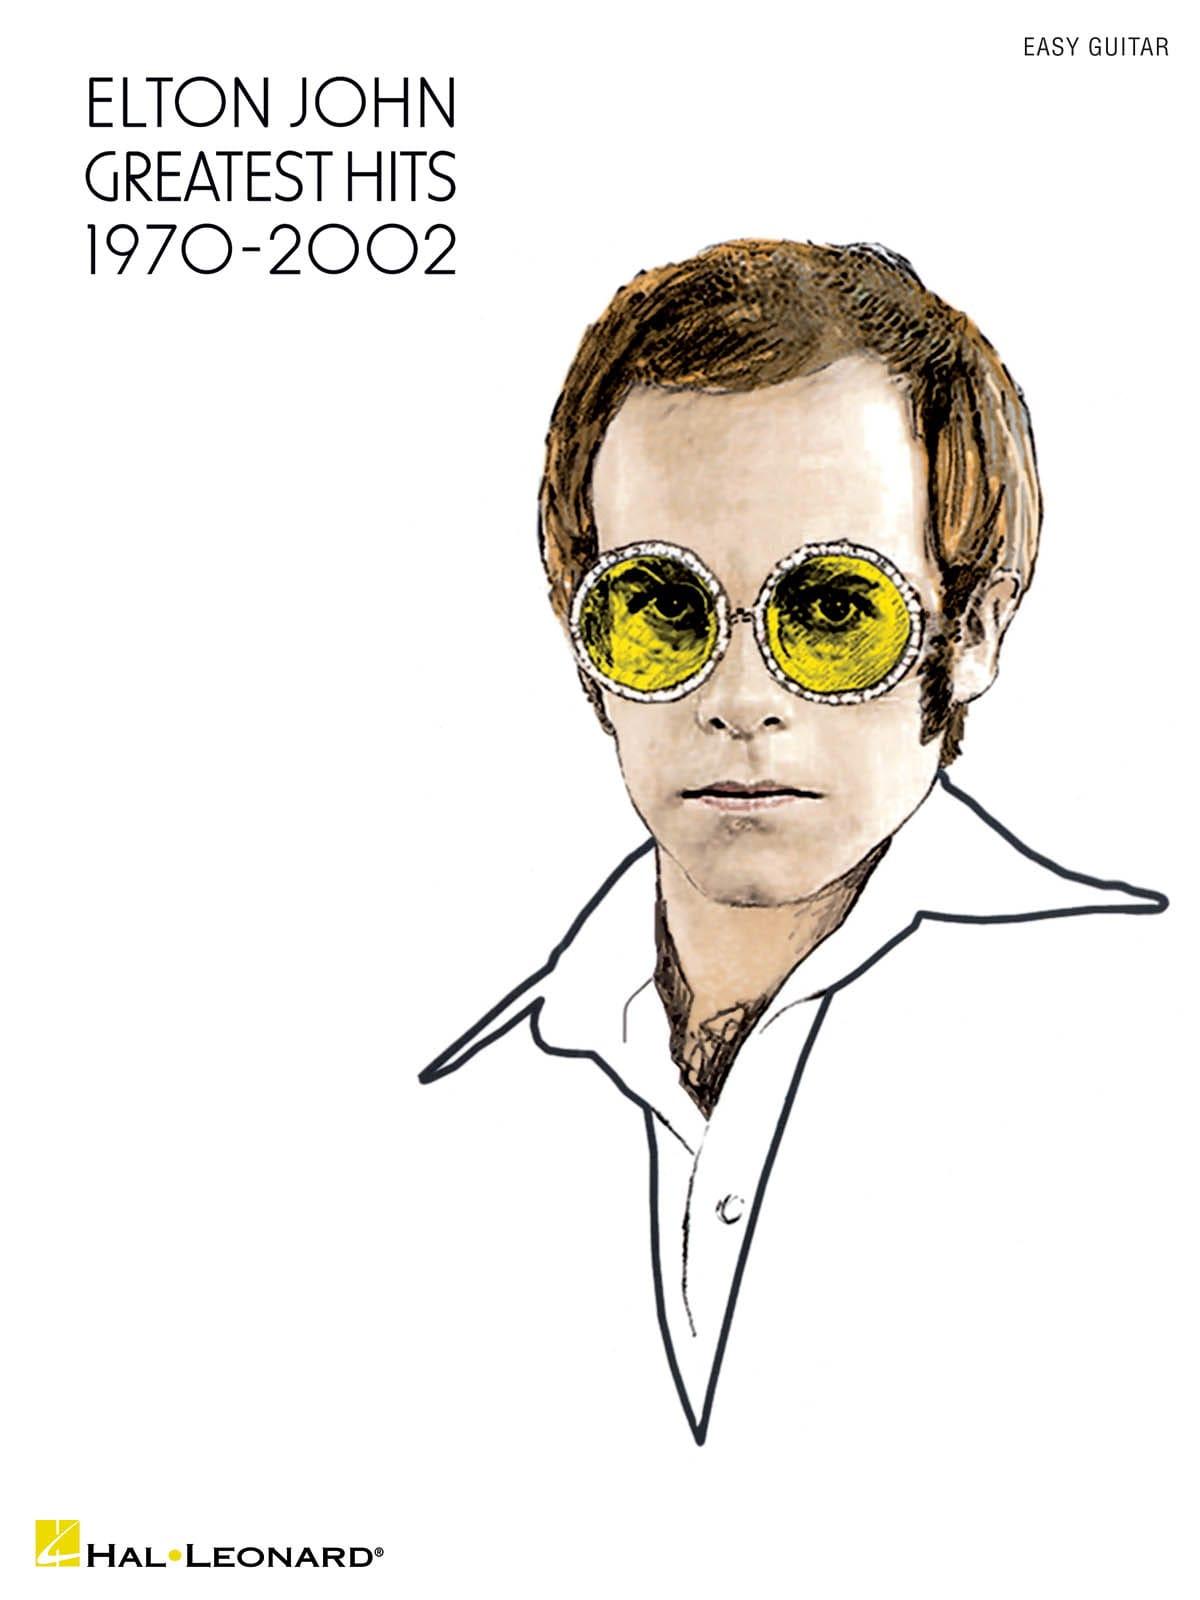 Greatest Hits 1970-2002 - Easy Guitar - Elton John - laflutedepan.com